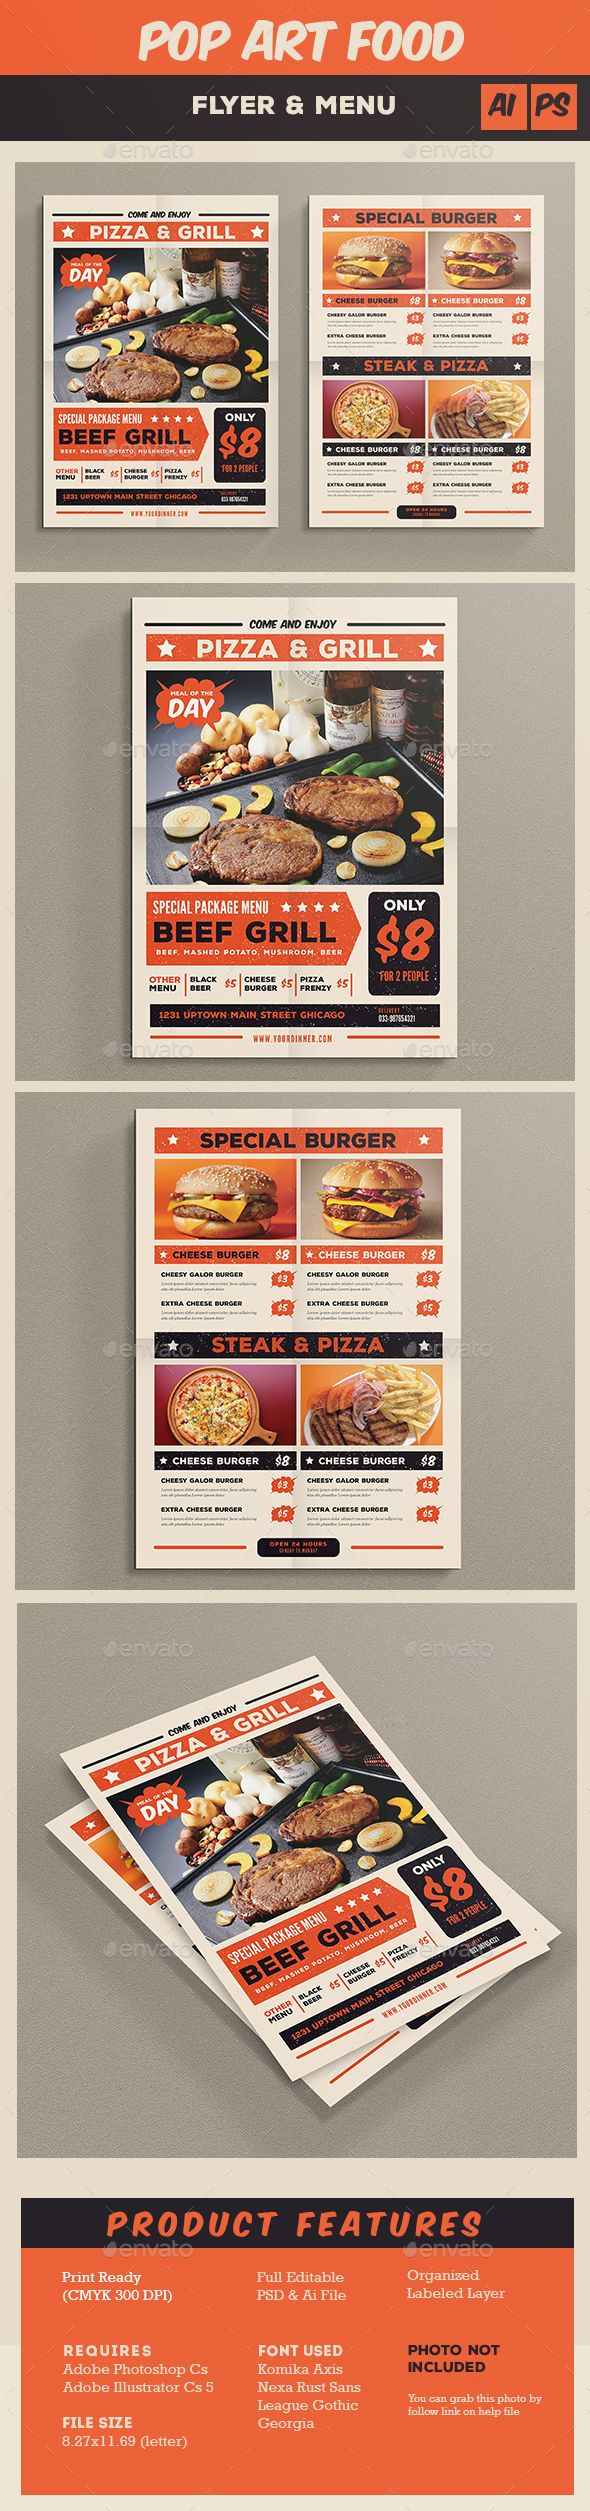 Pop Art Food  Menu Flyer Template PSD, Vector AI #design Download: http://graphicriver.net/item/pop-art-food-flyer-menu/13951700?ref=ksioks